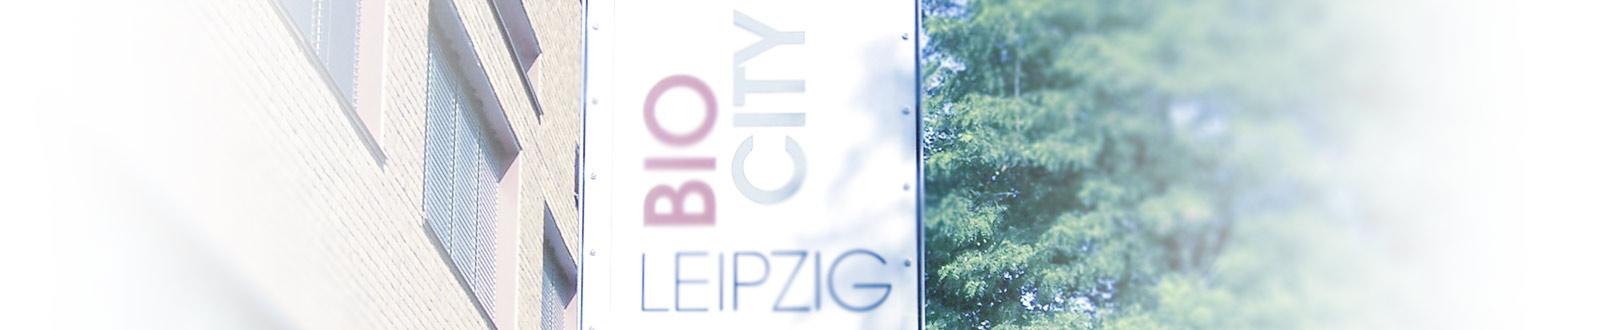 slider-biocity